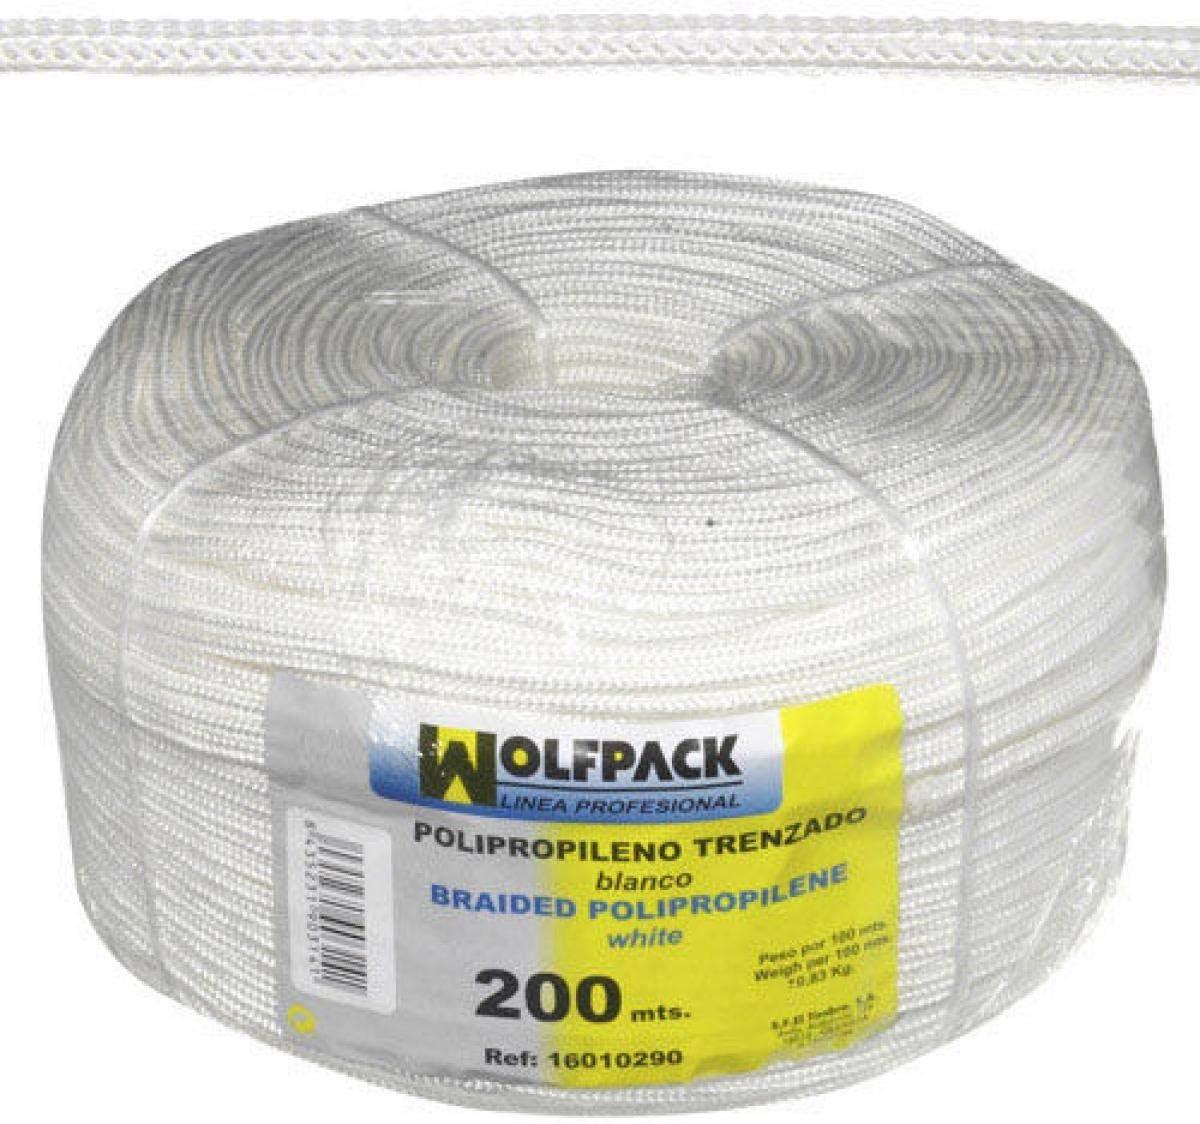 WOLFPACK LINEA PROFESIONAL 16010290 Cuerda Trenzada Polipropileno Blanca (Bobina 200 m.)